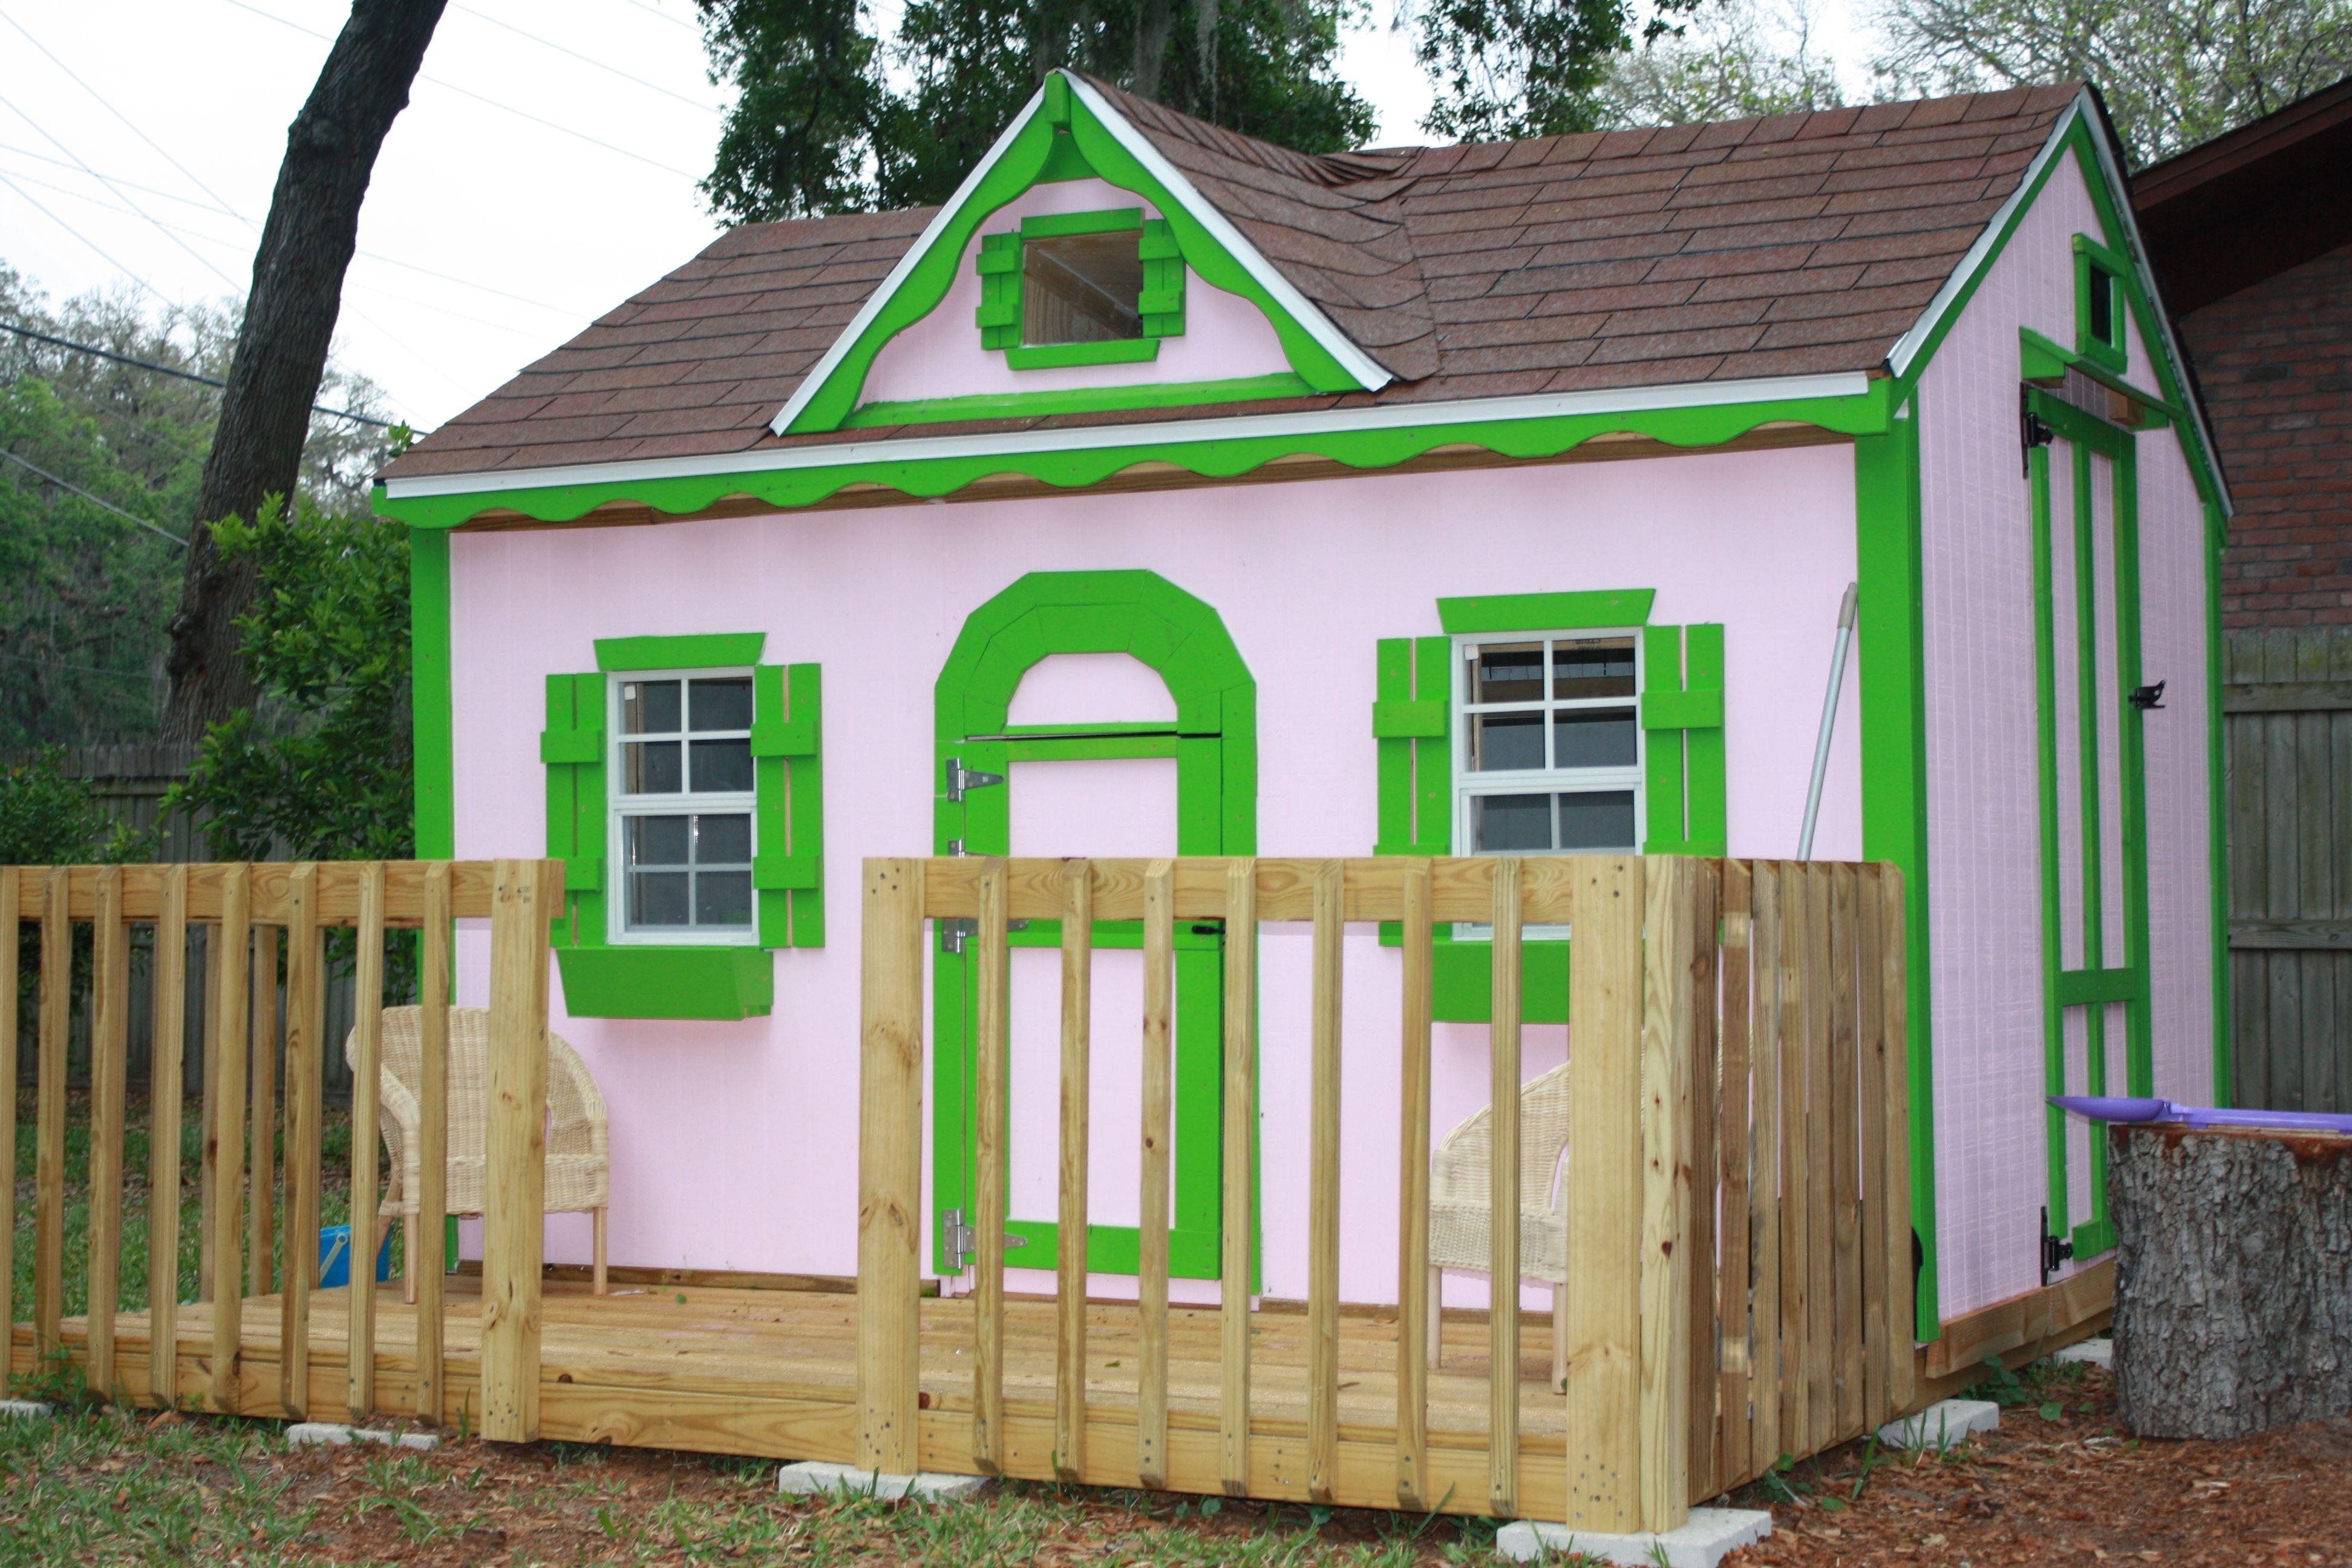 Kids Playhouse Spots 4 Tots Llc Jacksonville Fl Children S Playhouse Boys Girls Play Houses Playhouse Outdoor Childrens Playhouse